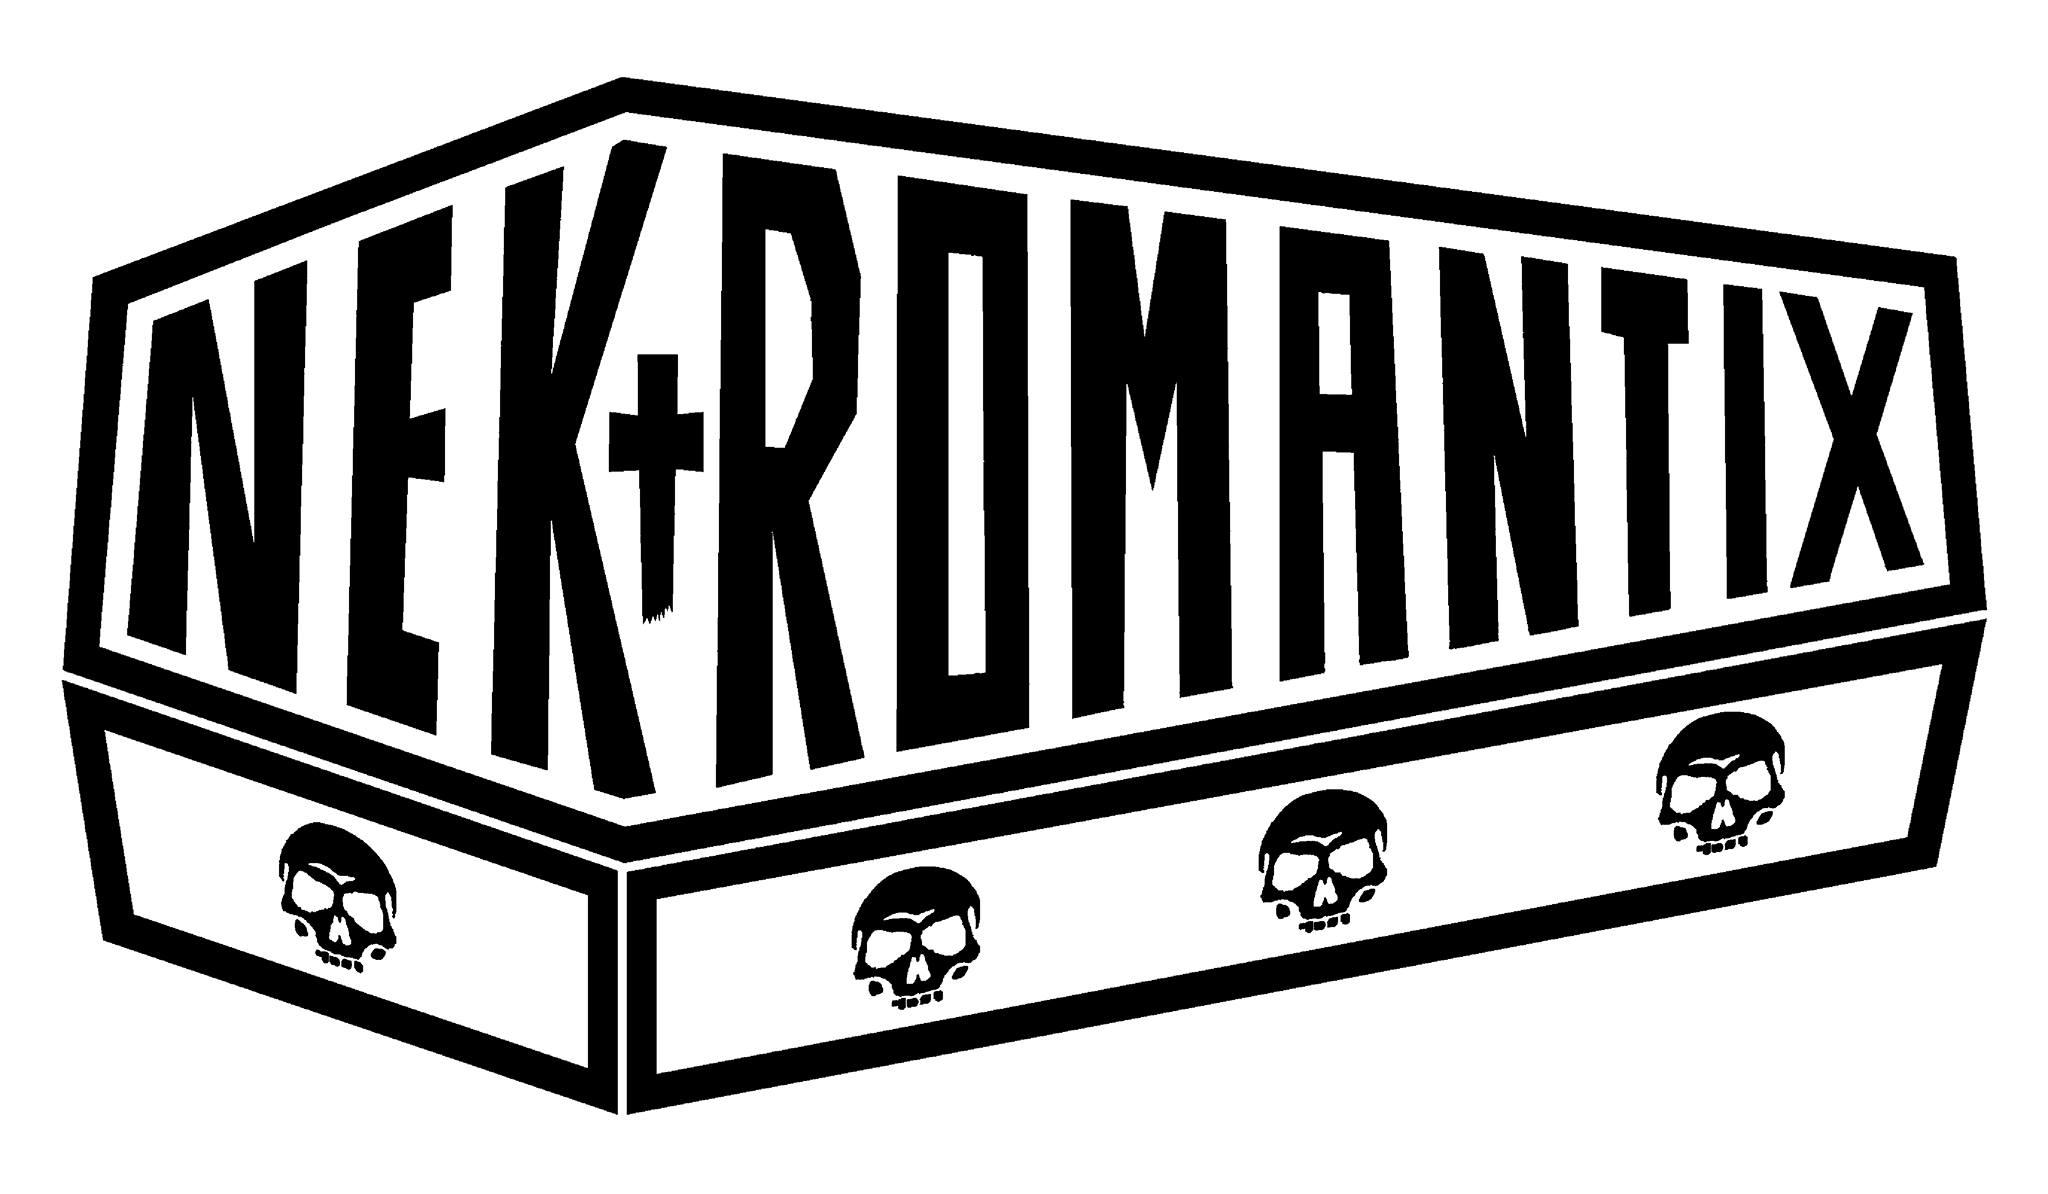 11.04.2017 – Nekromantix + Howlin' Jaws #Rock